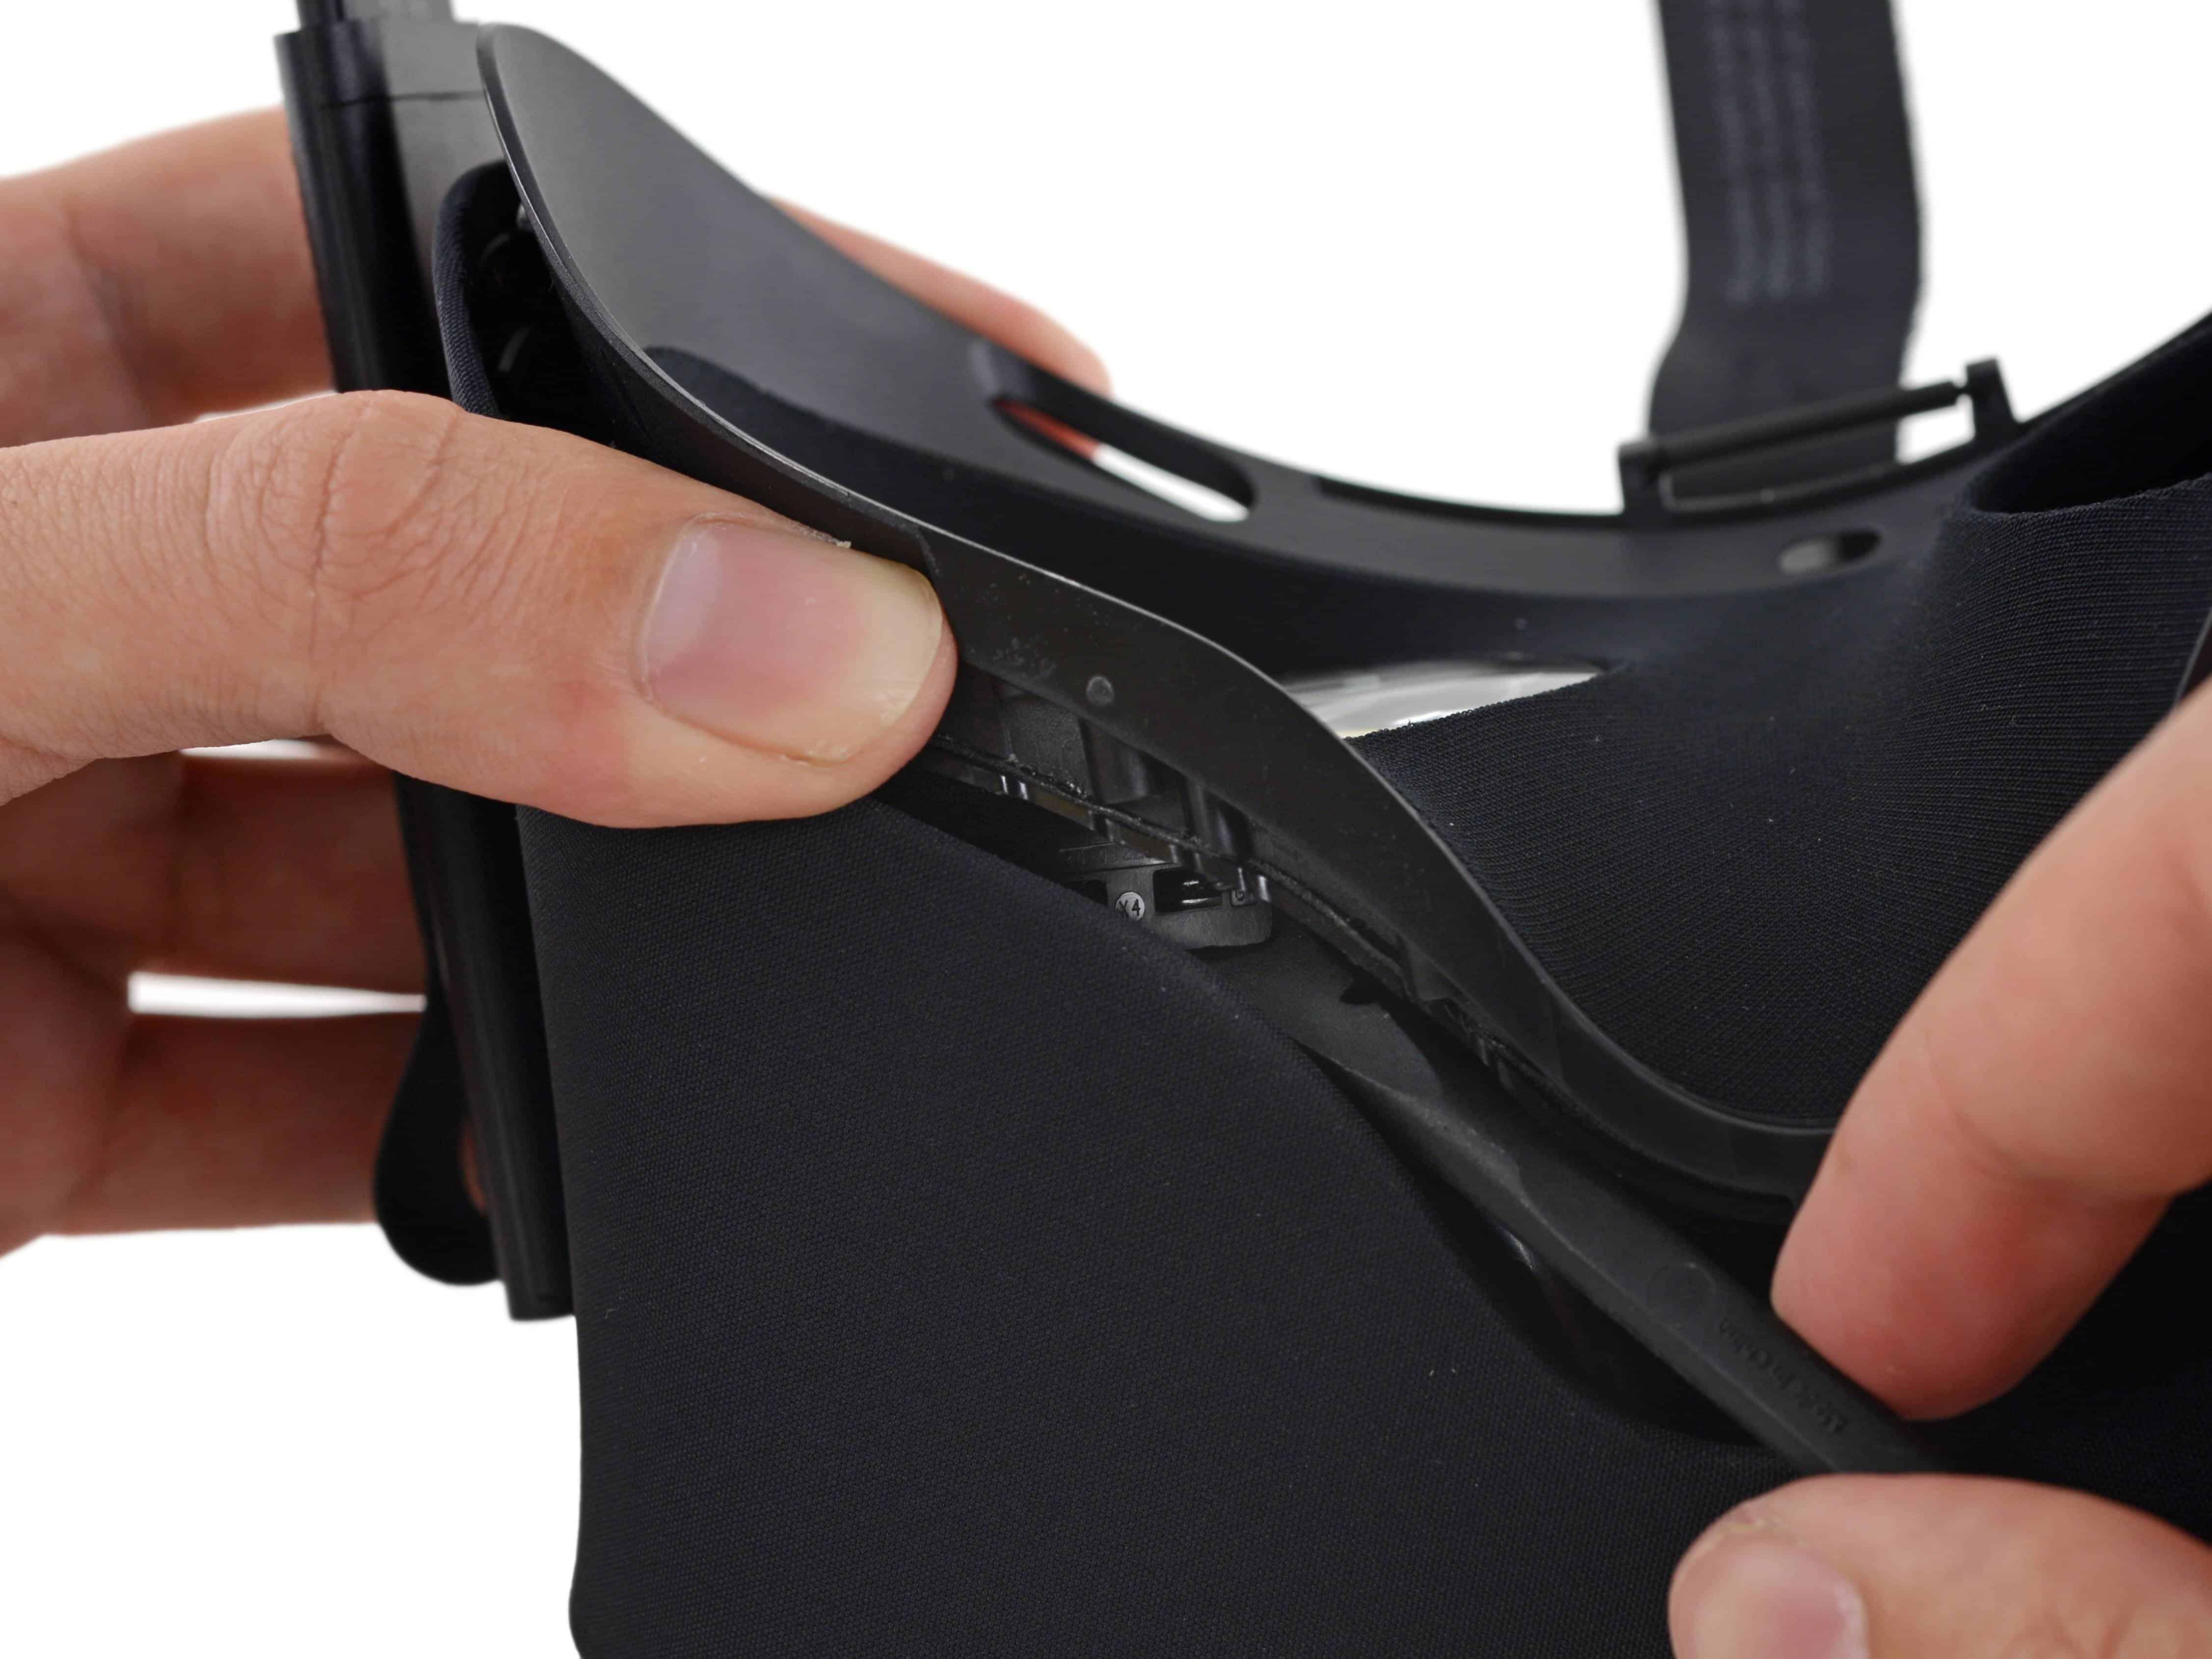 Oculus Rift Teardown 2